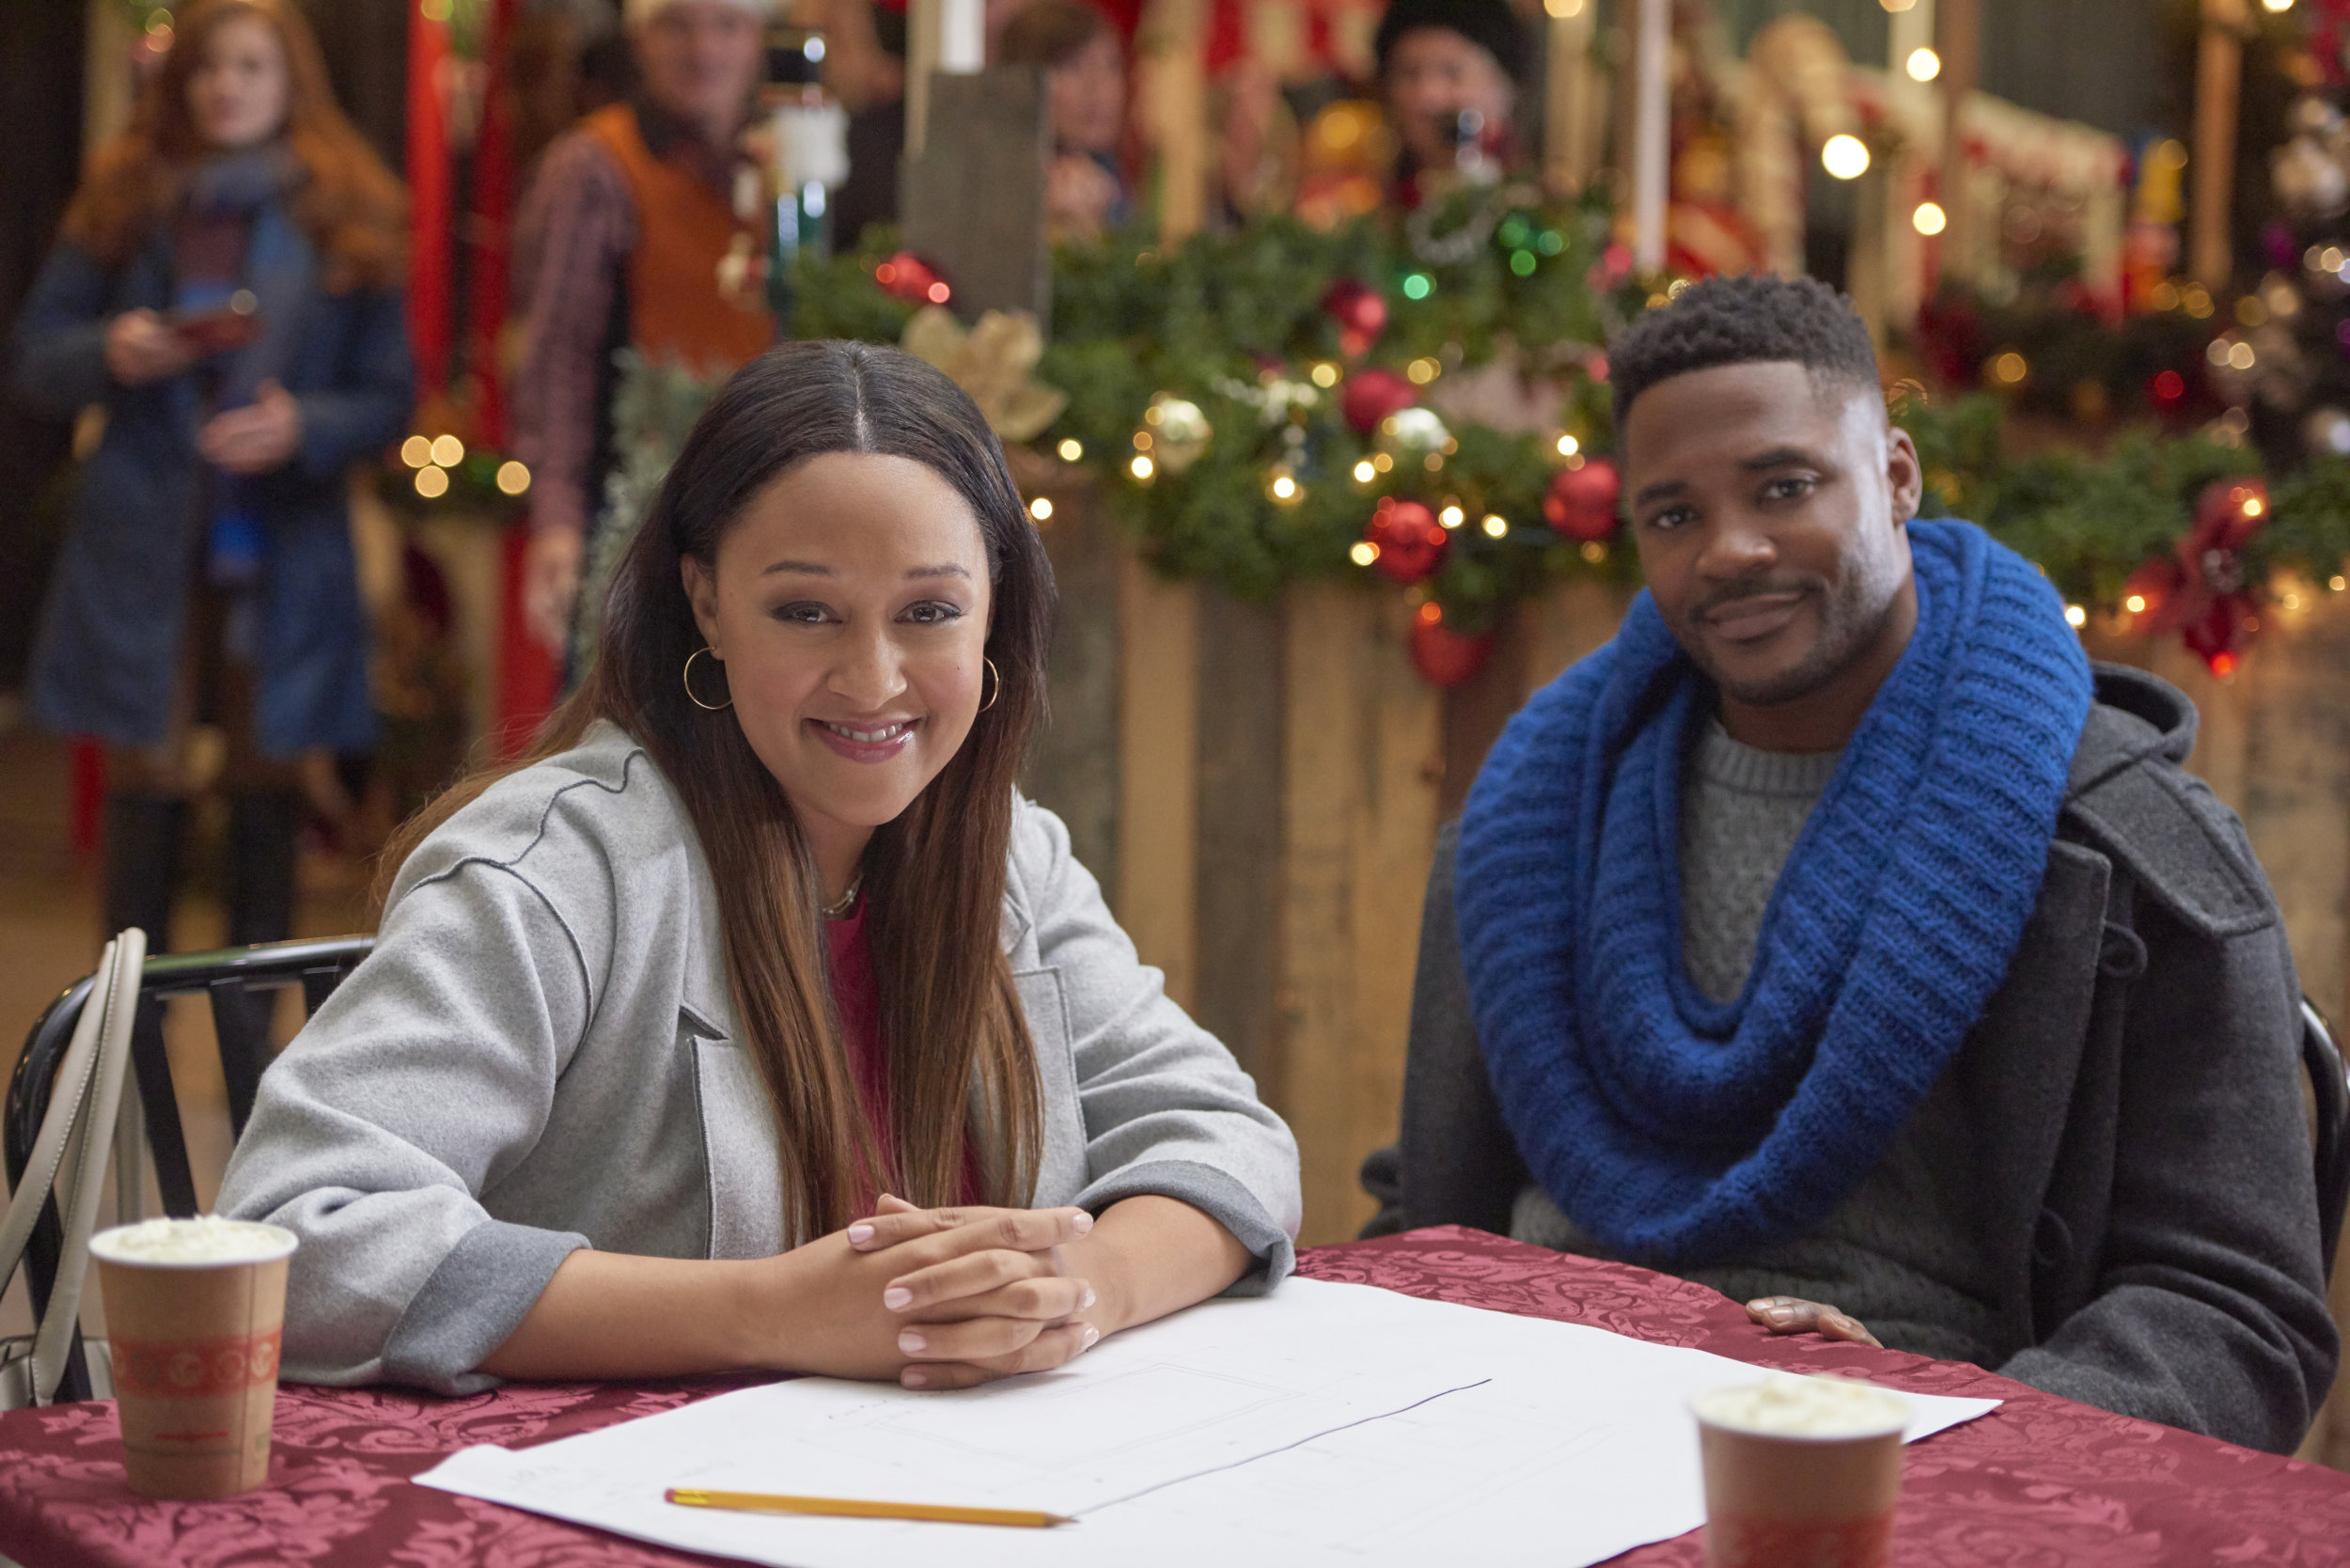 Hallmarkmoviesandmysteries Christmas 2020 Preview   Christmas in July 2020   Hallmark Movies & Mysteries